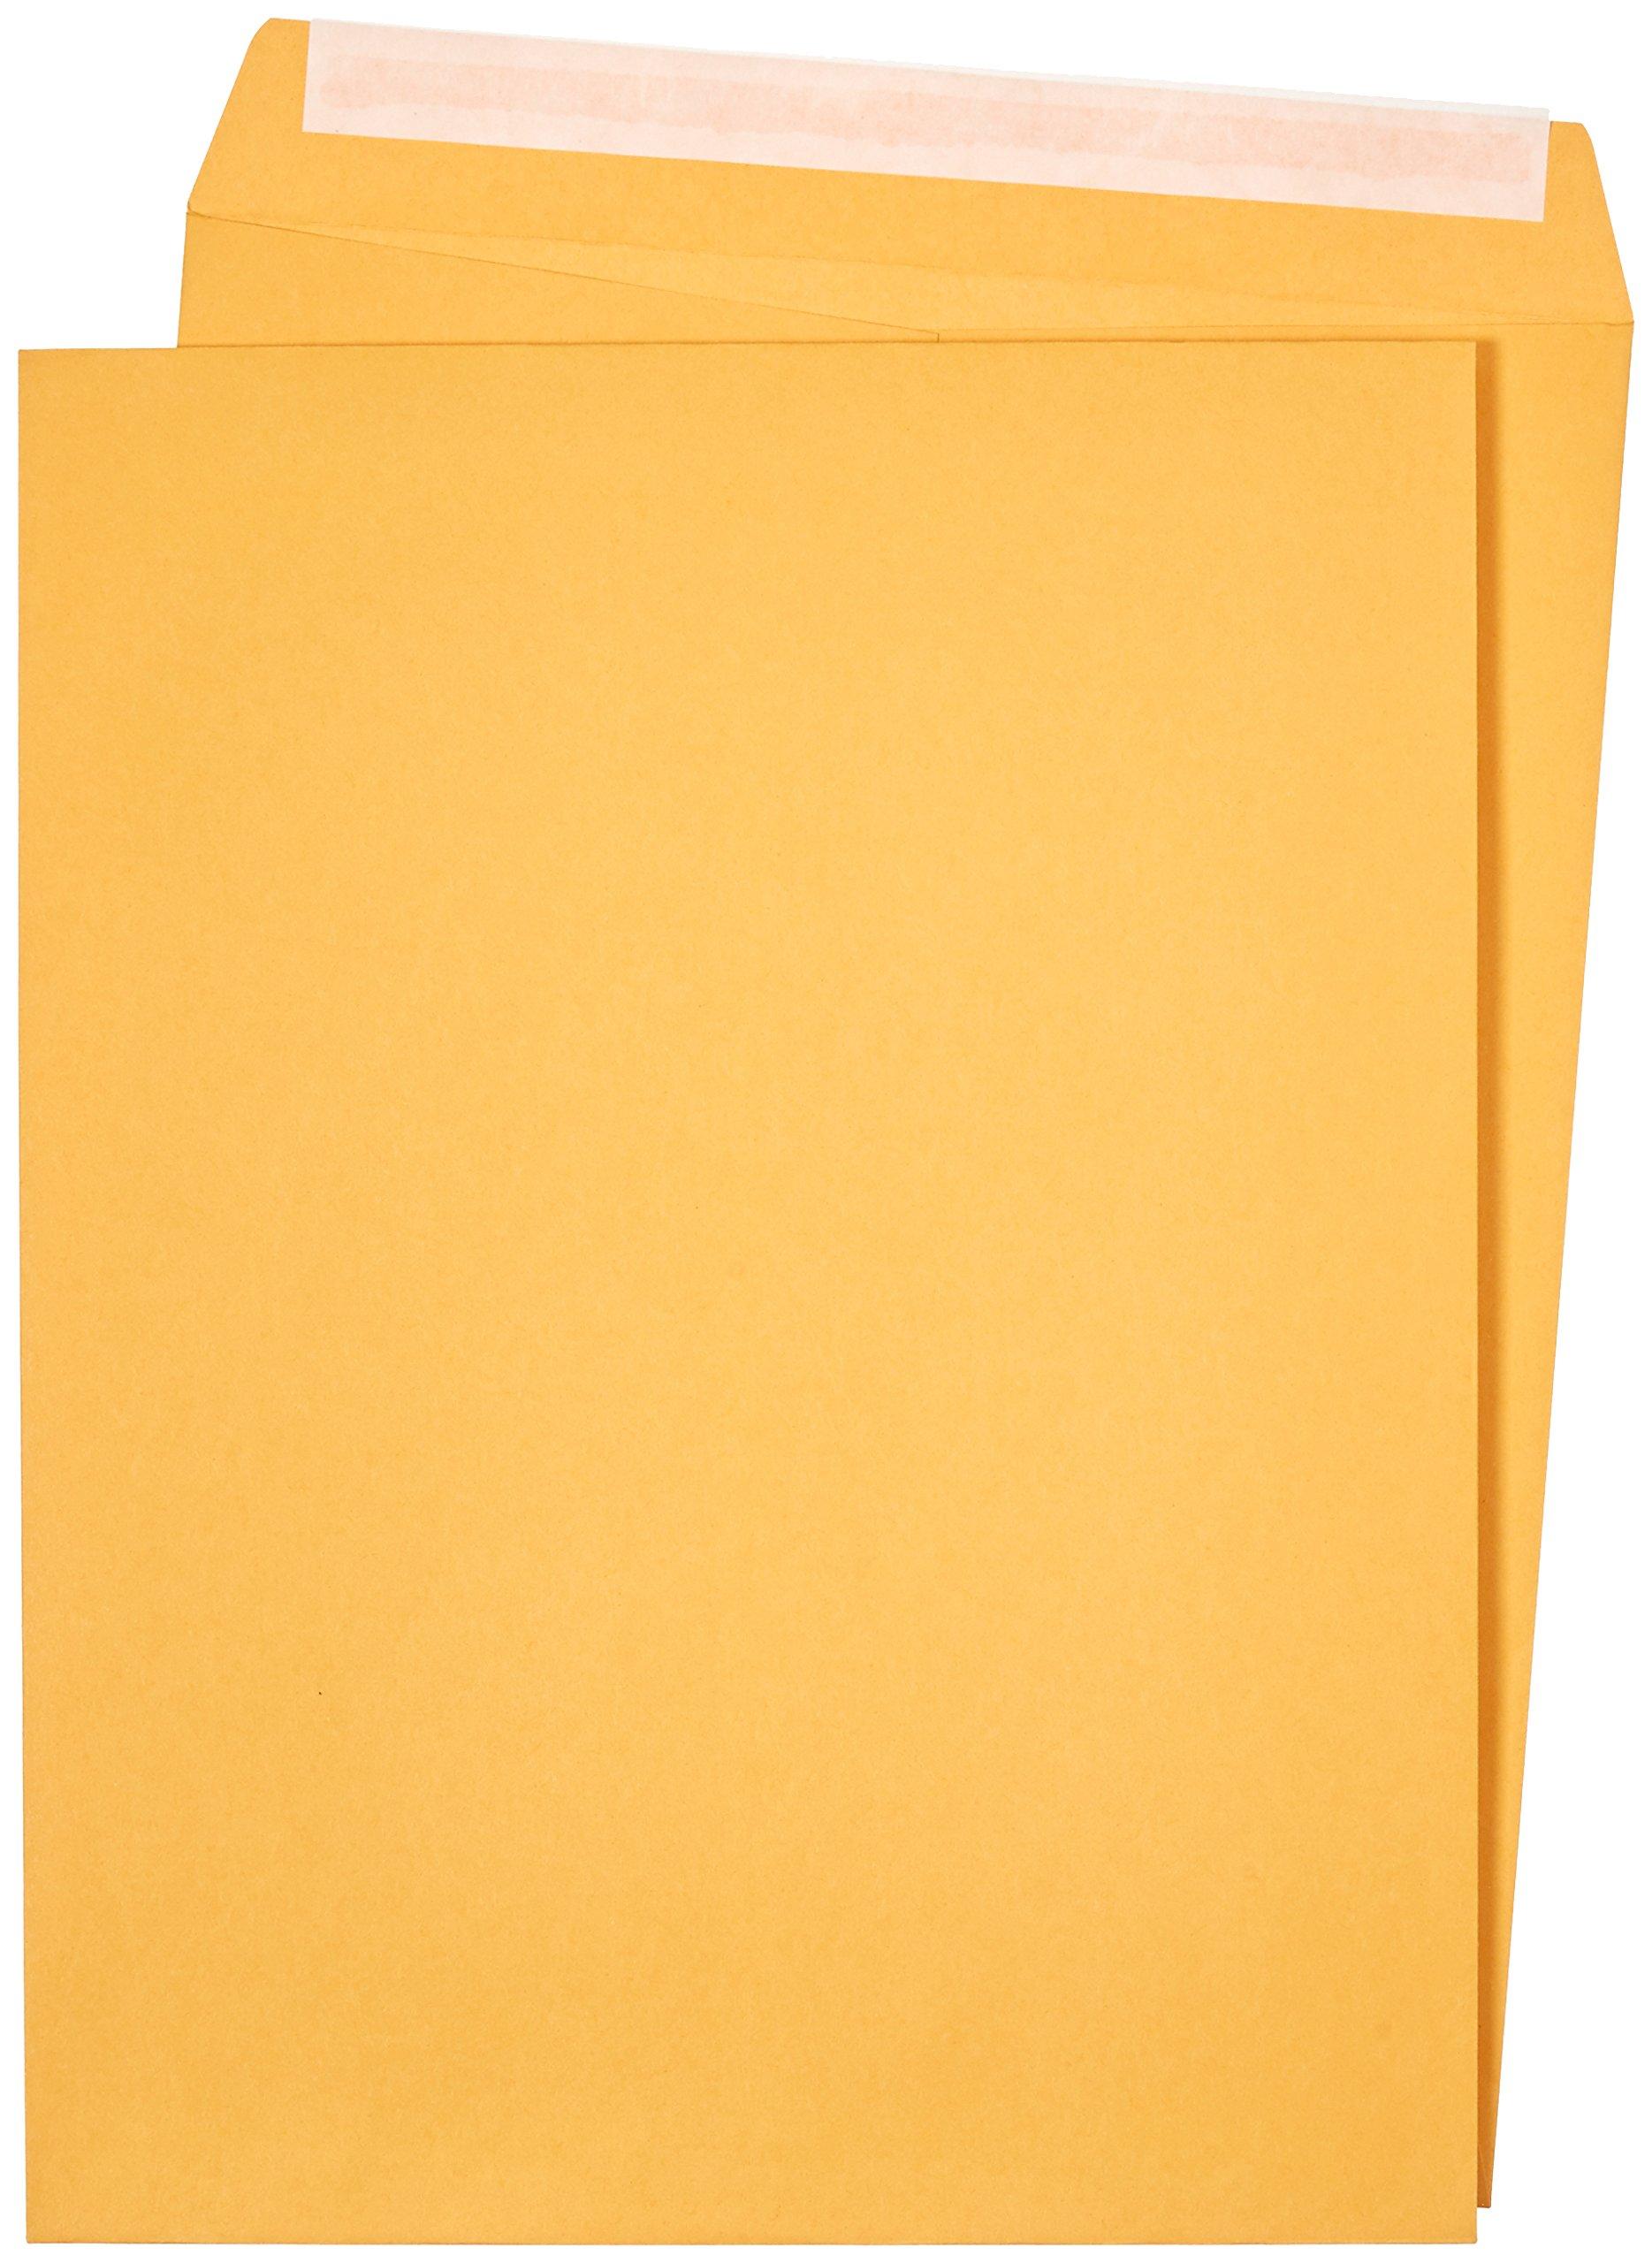 AmazonBasics Catalog Envelopes, Peel & Seal, 10 x 13 Inch, Brown Kraft, 100-Pack